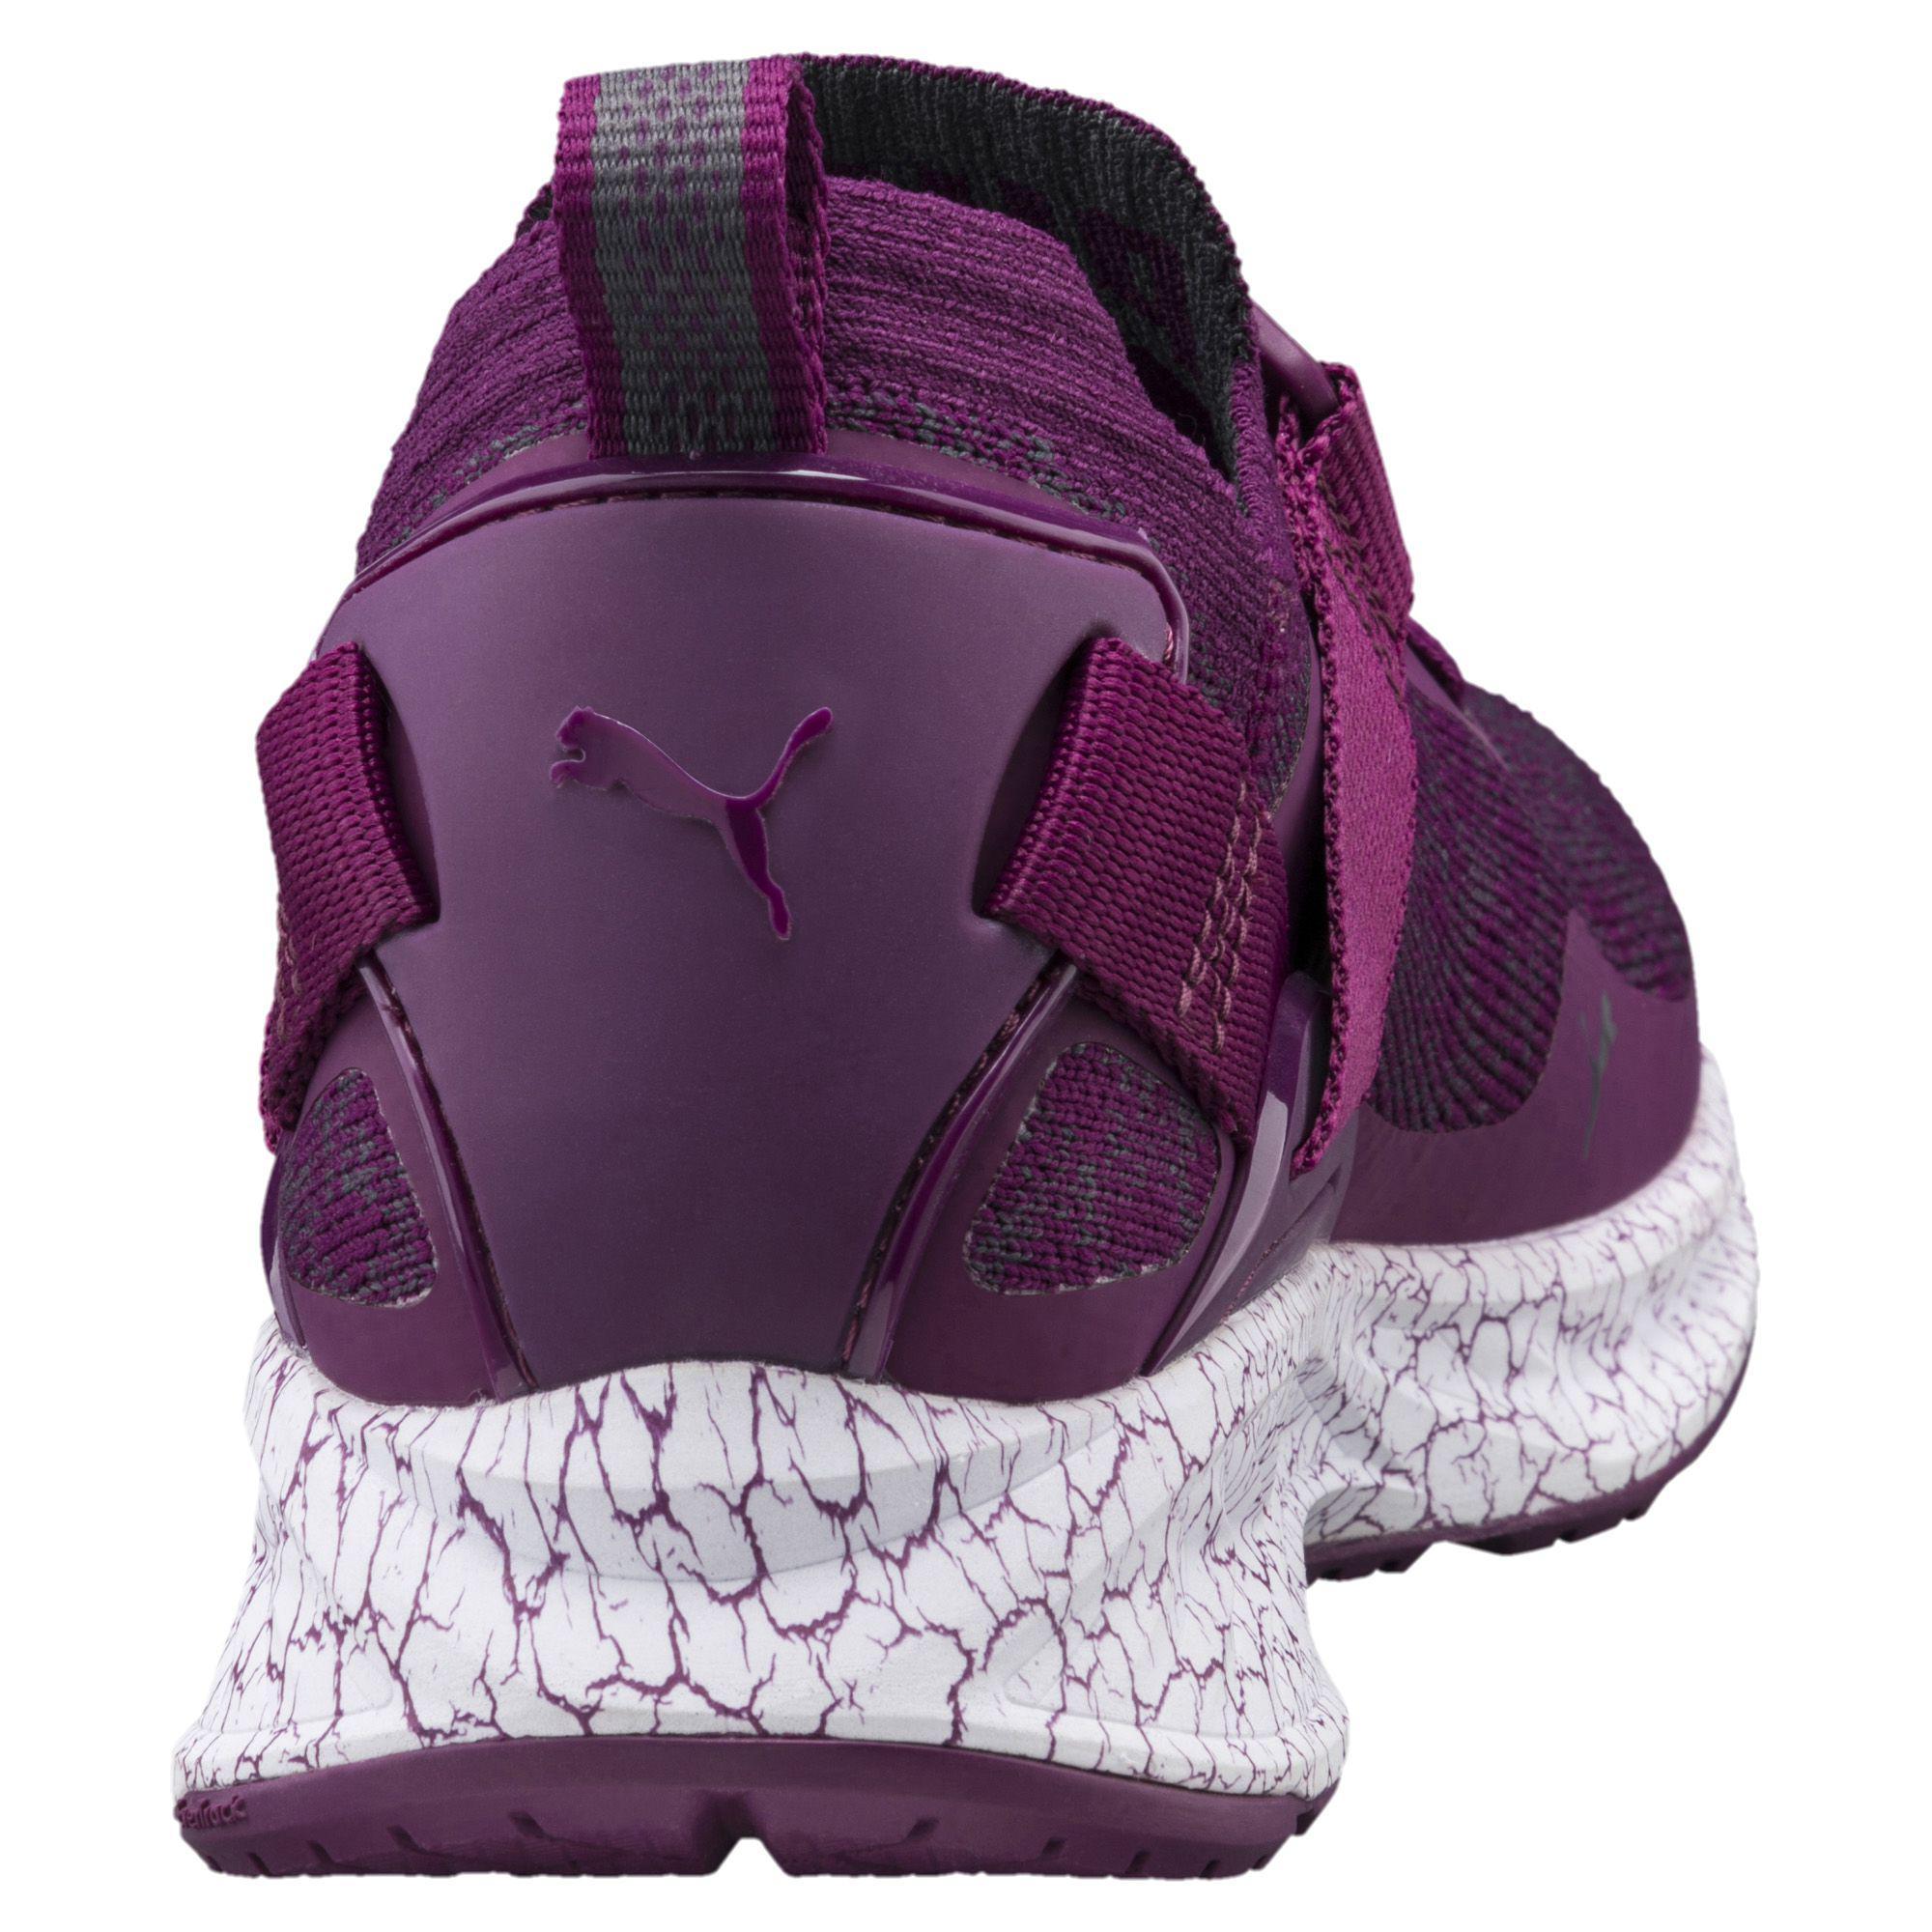 7461c995378d Lyst - PUMA Ignite Evoknit Lo Hypernature Women s Training Shoes in ...